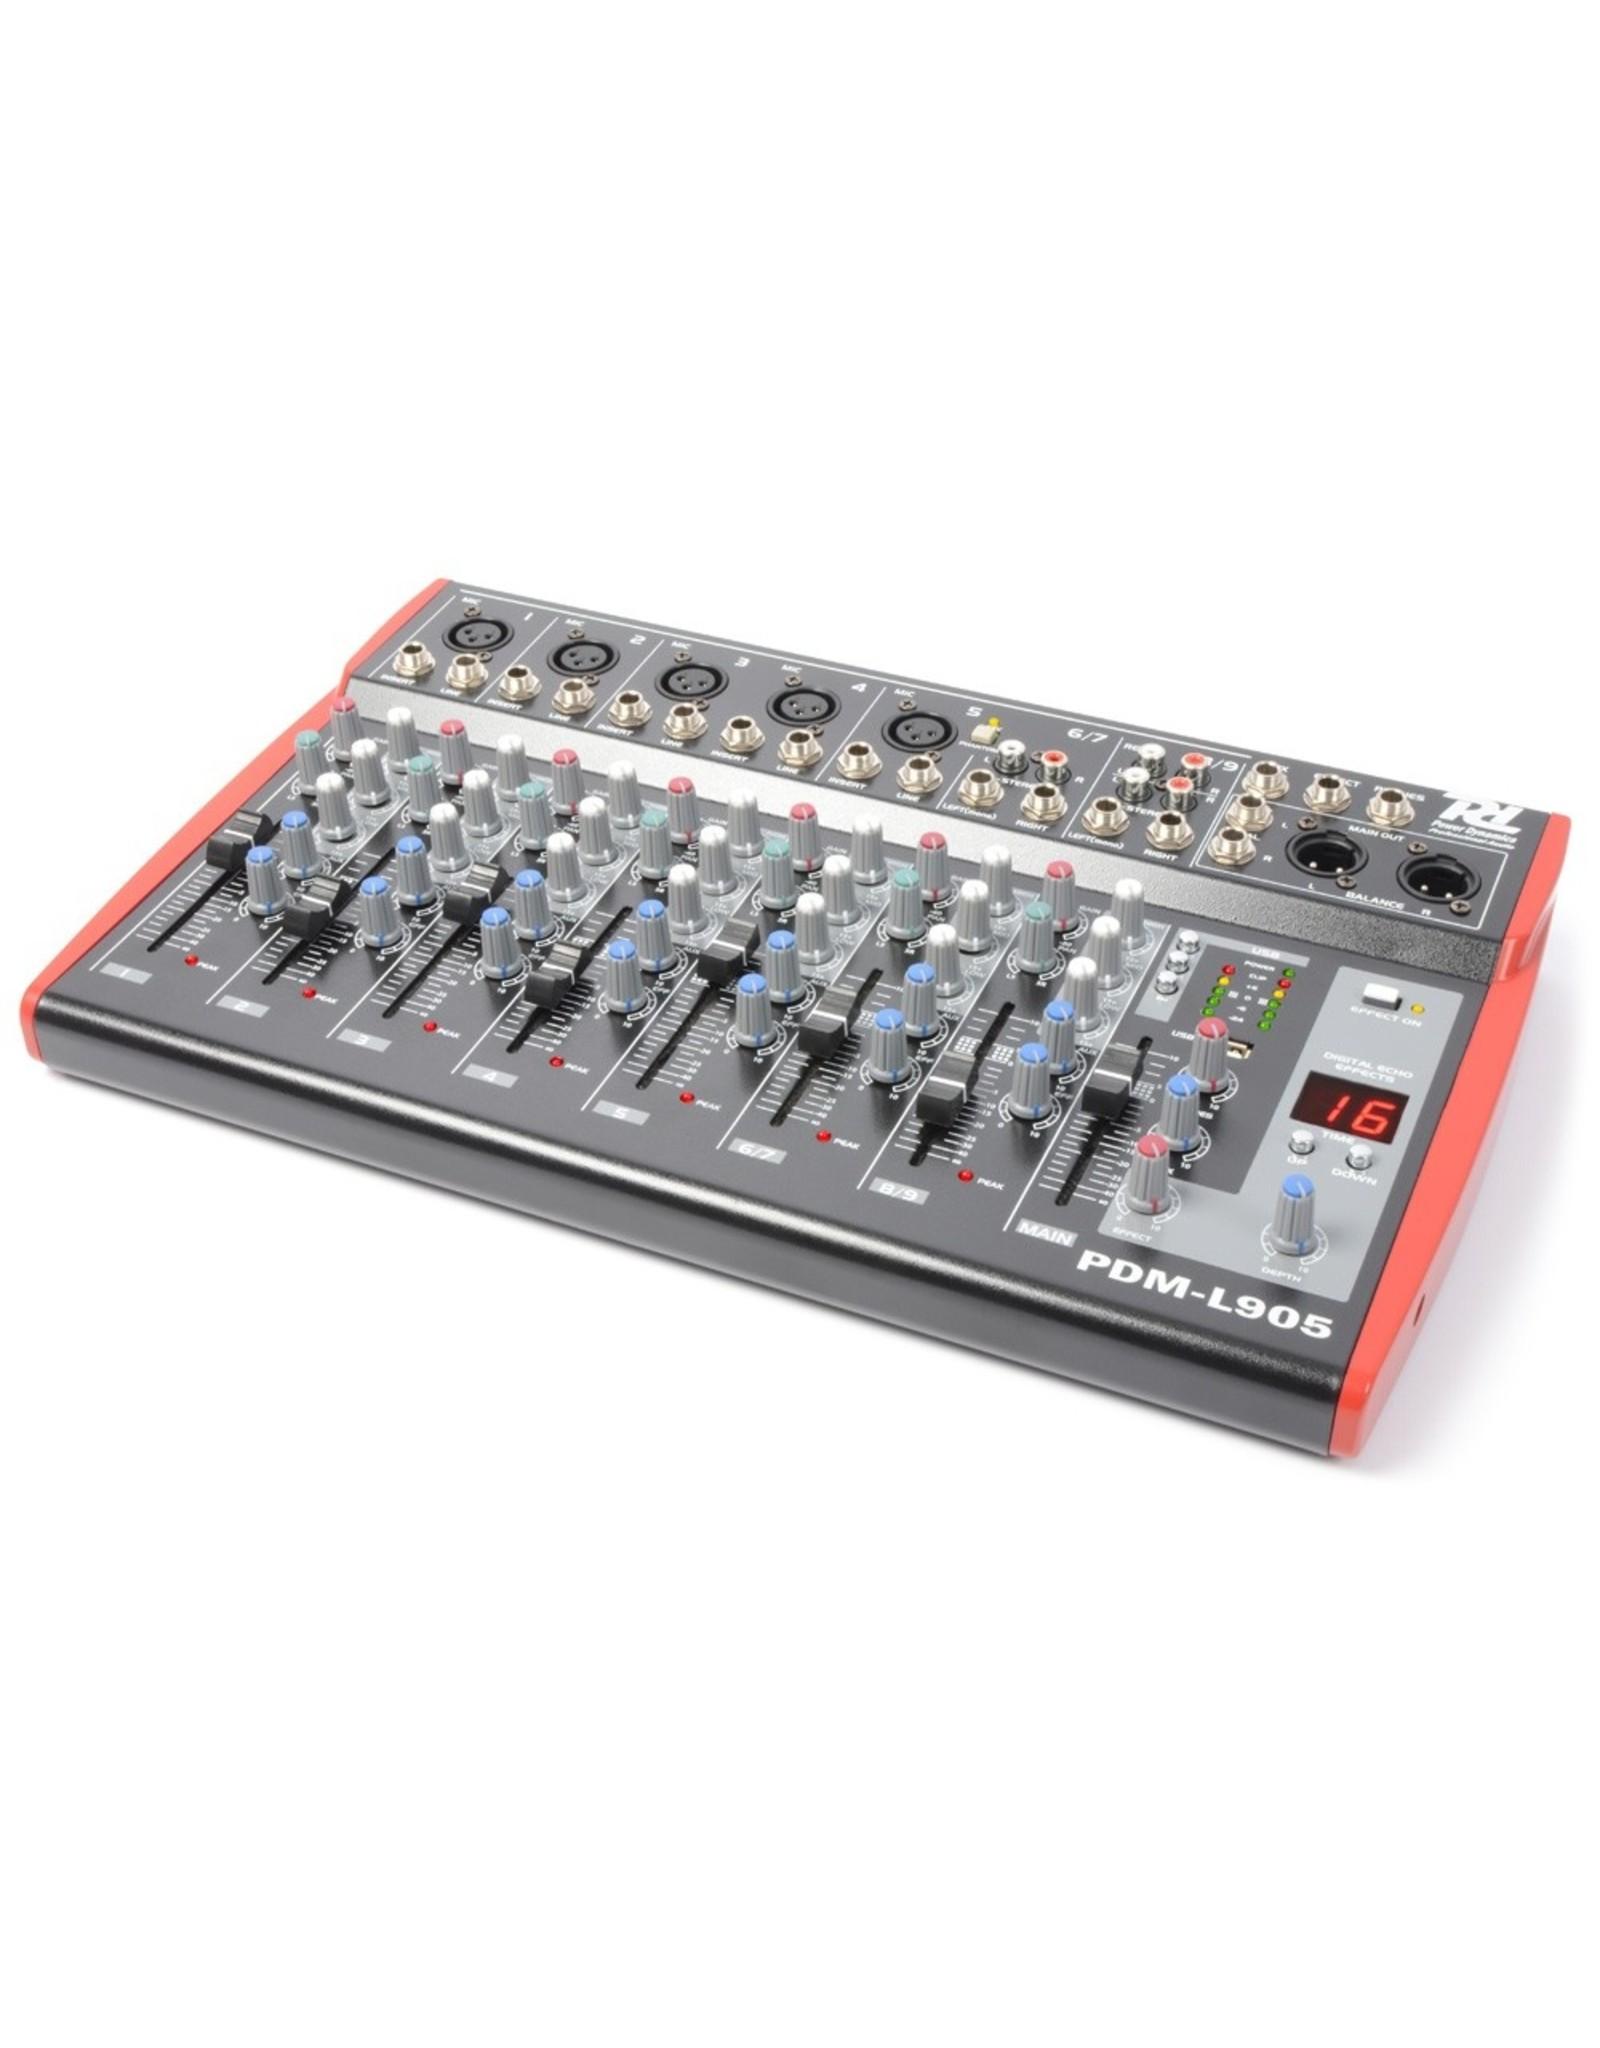 Power Dynamics Power Dynamics PDM-L905 Muziek Mixer 9-Kanaals MP3/ECHO